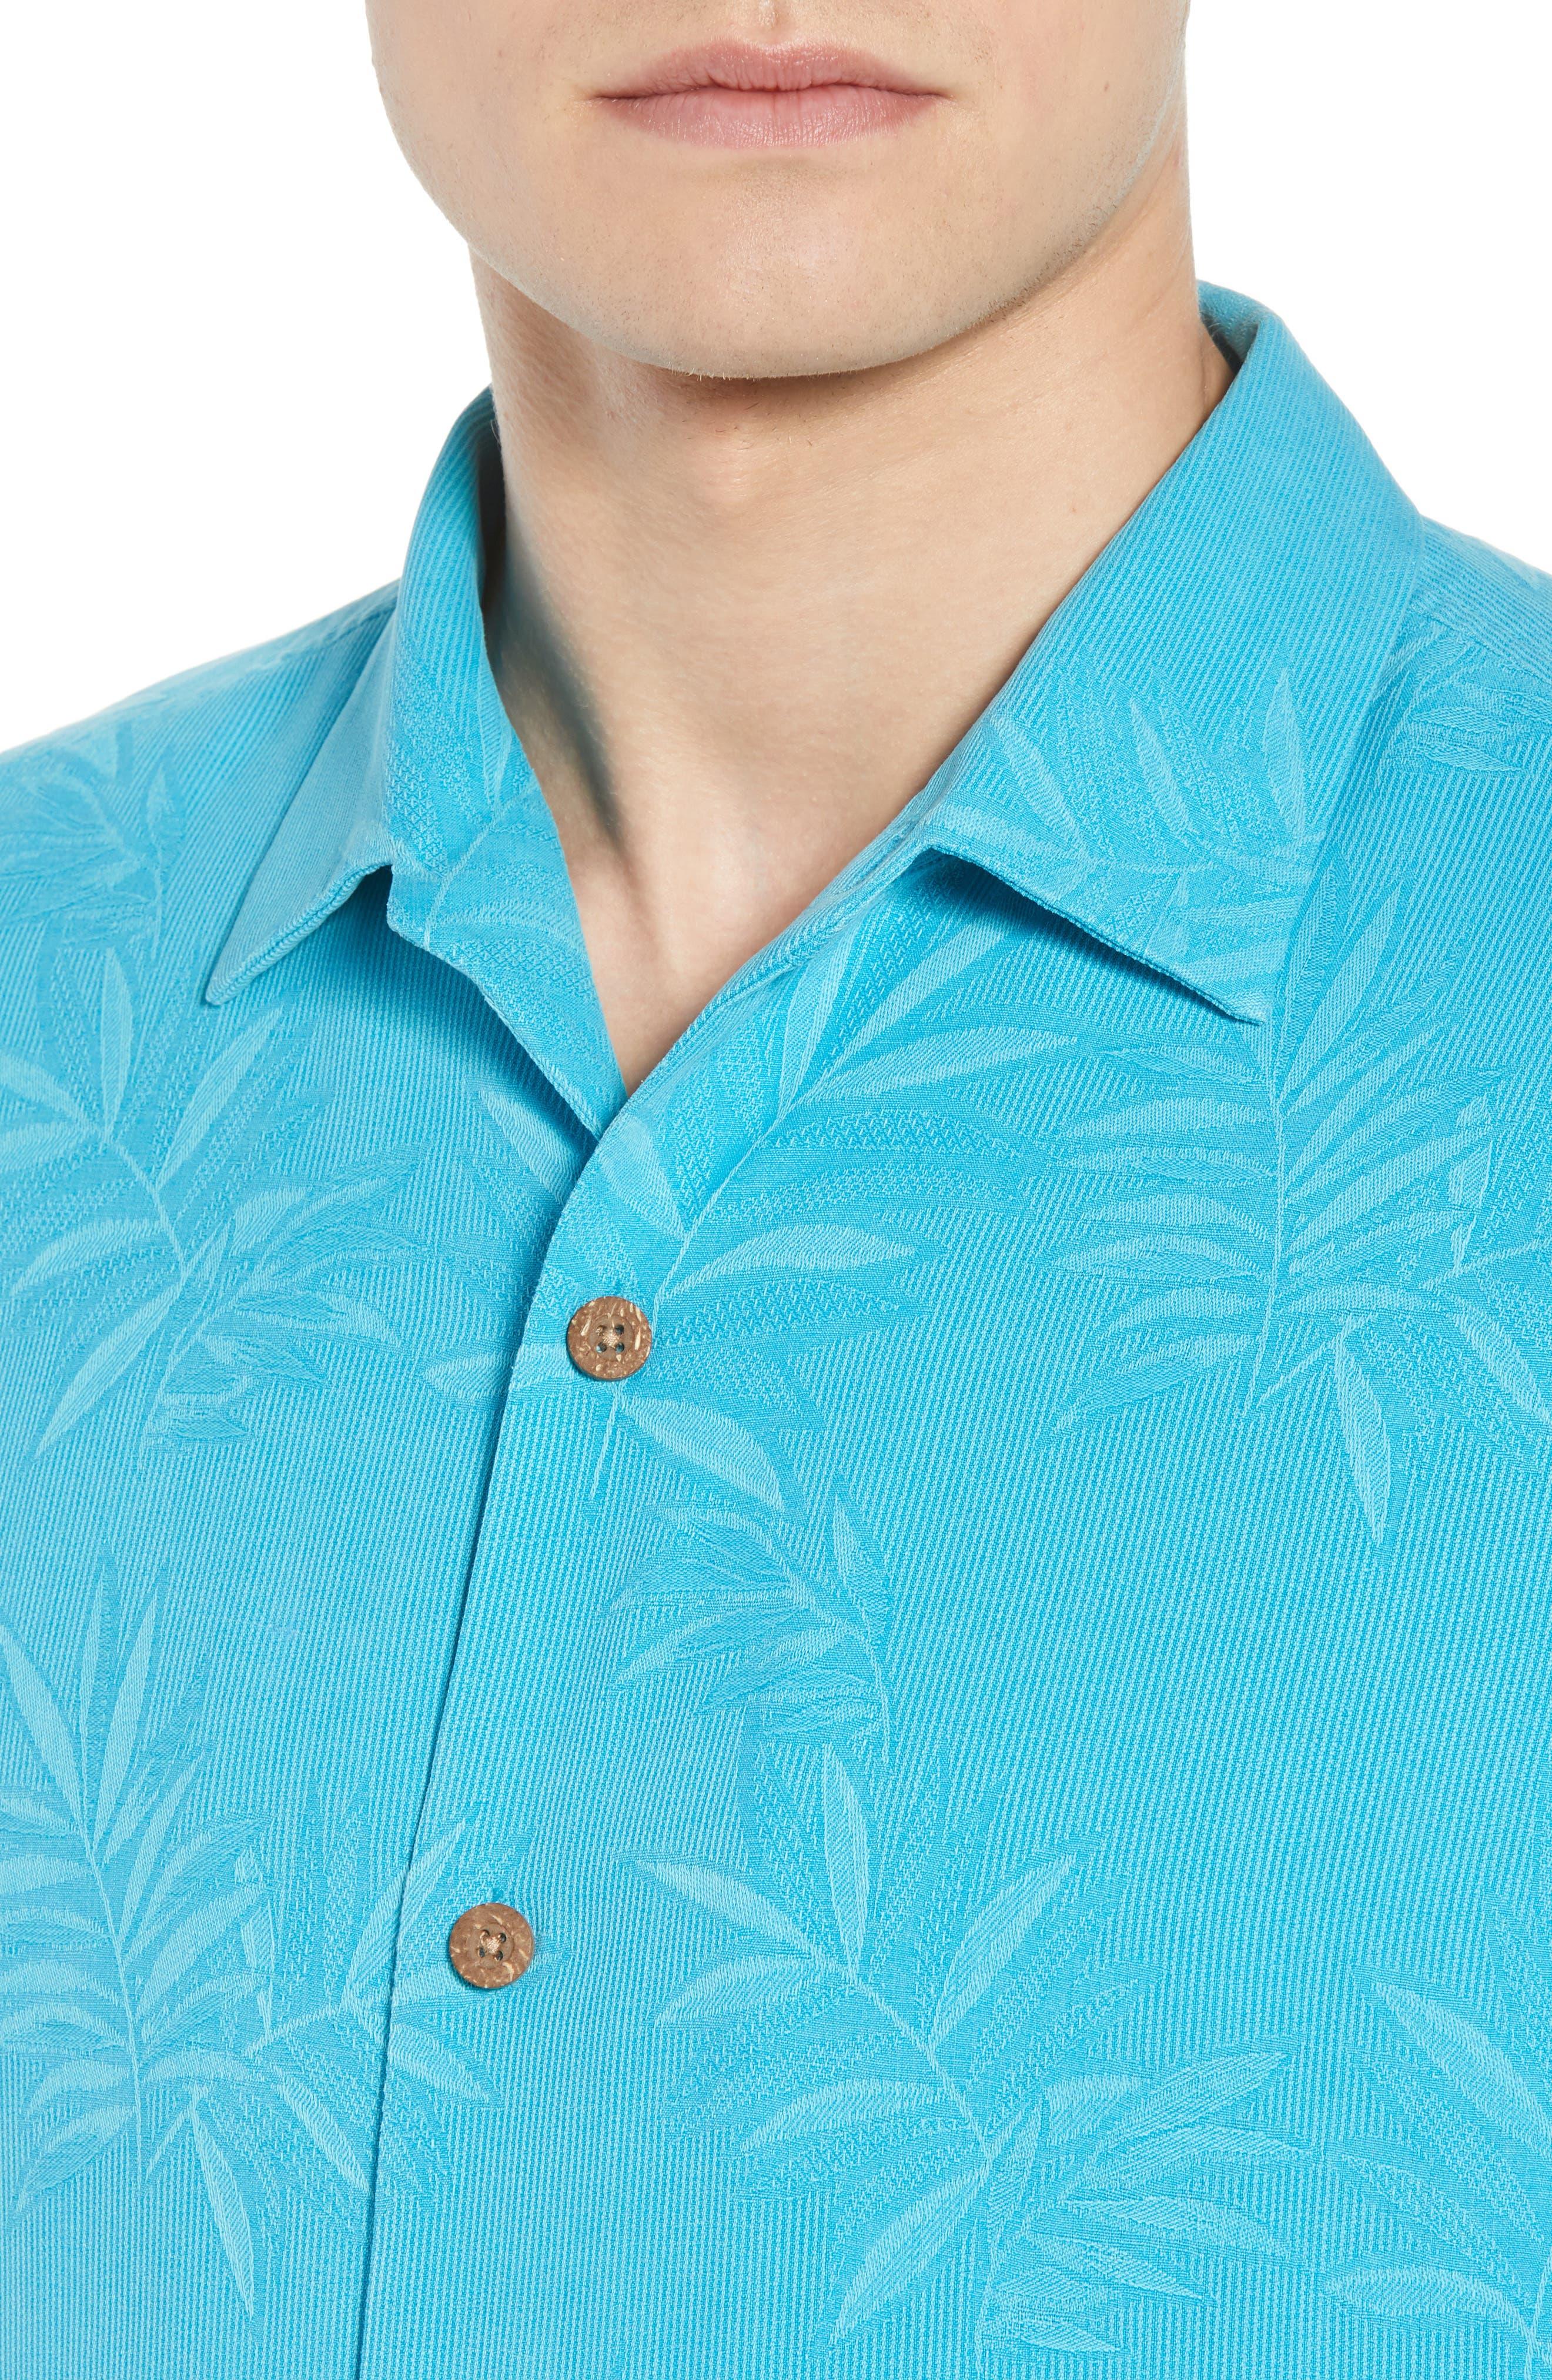 Luau Floral Silk Shirt,                             Alternate thumbnail 2, color,                             Pool Party Blue